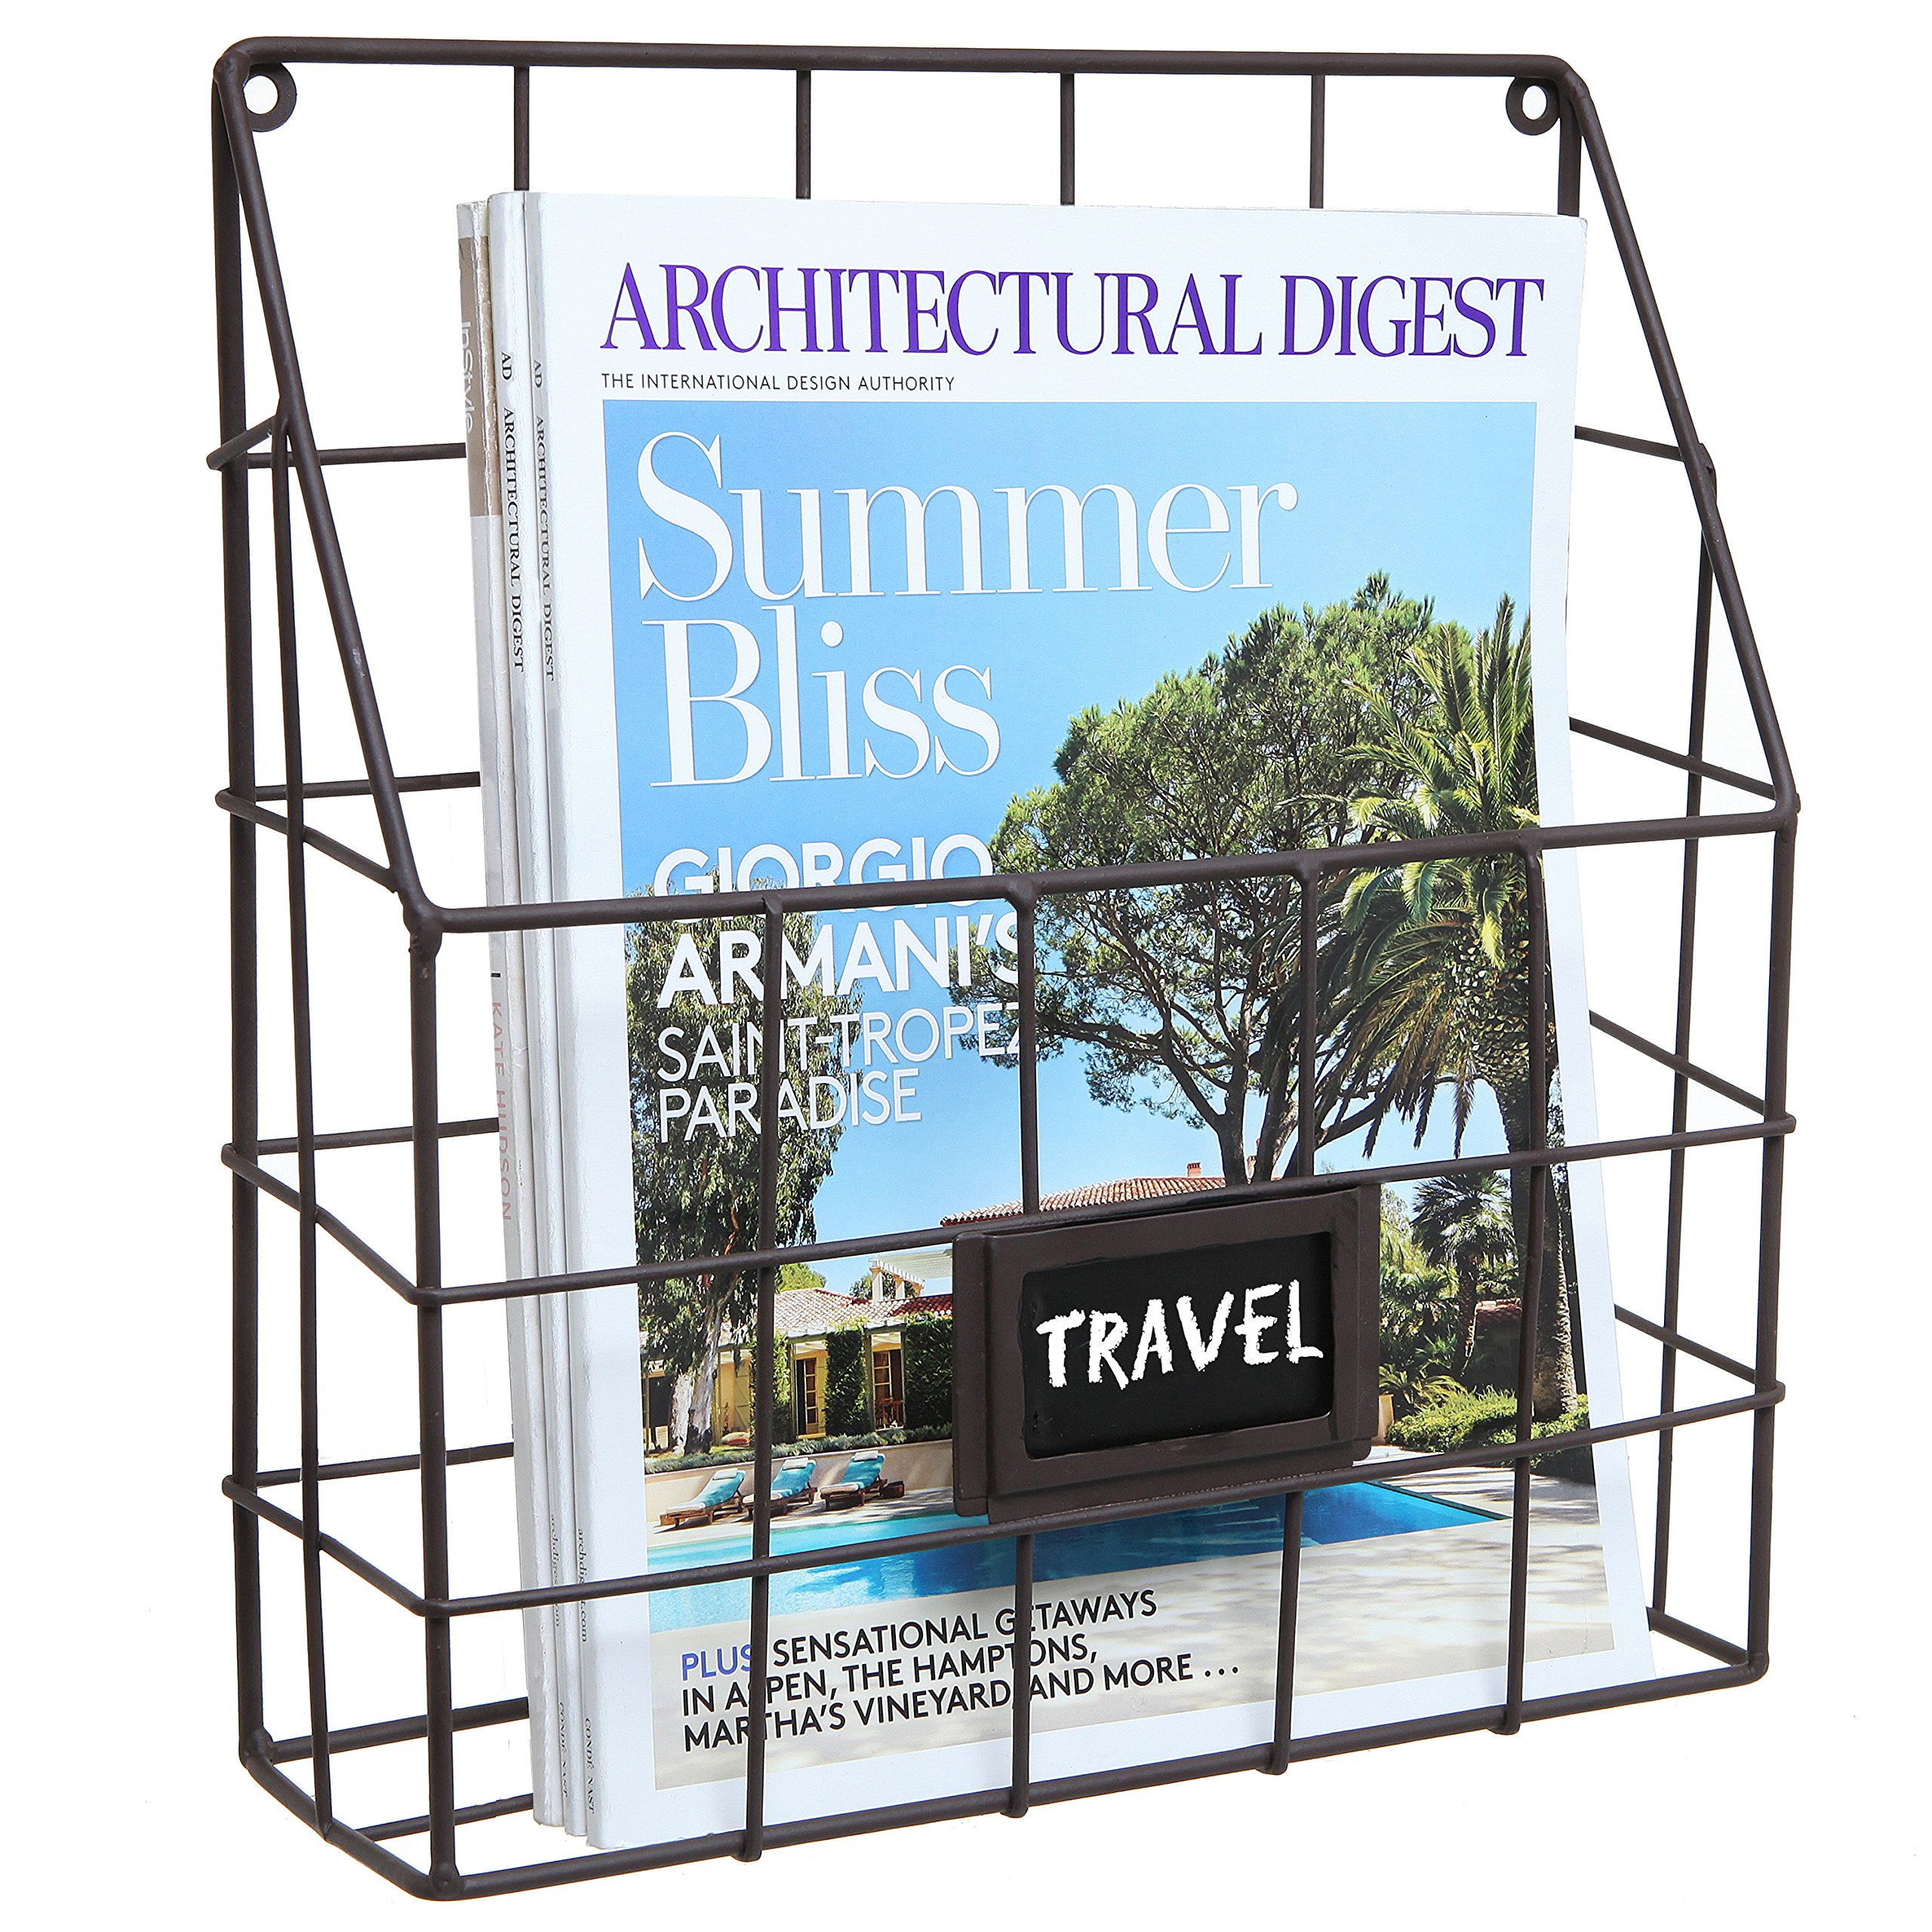 Brown Metal Wire Wall Magazine Rack Bin / Newspaper Rack / Wall Mounted Mail Sorter with Chalkboard Label